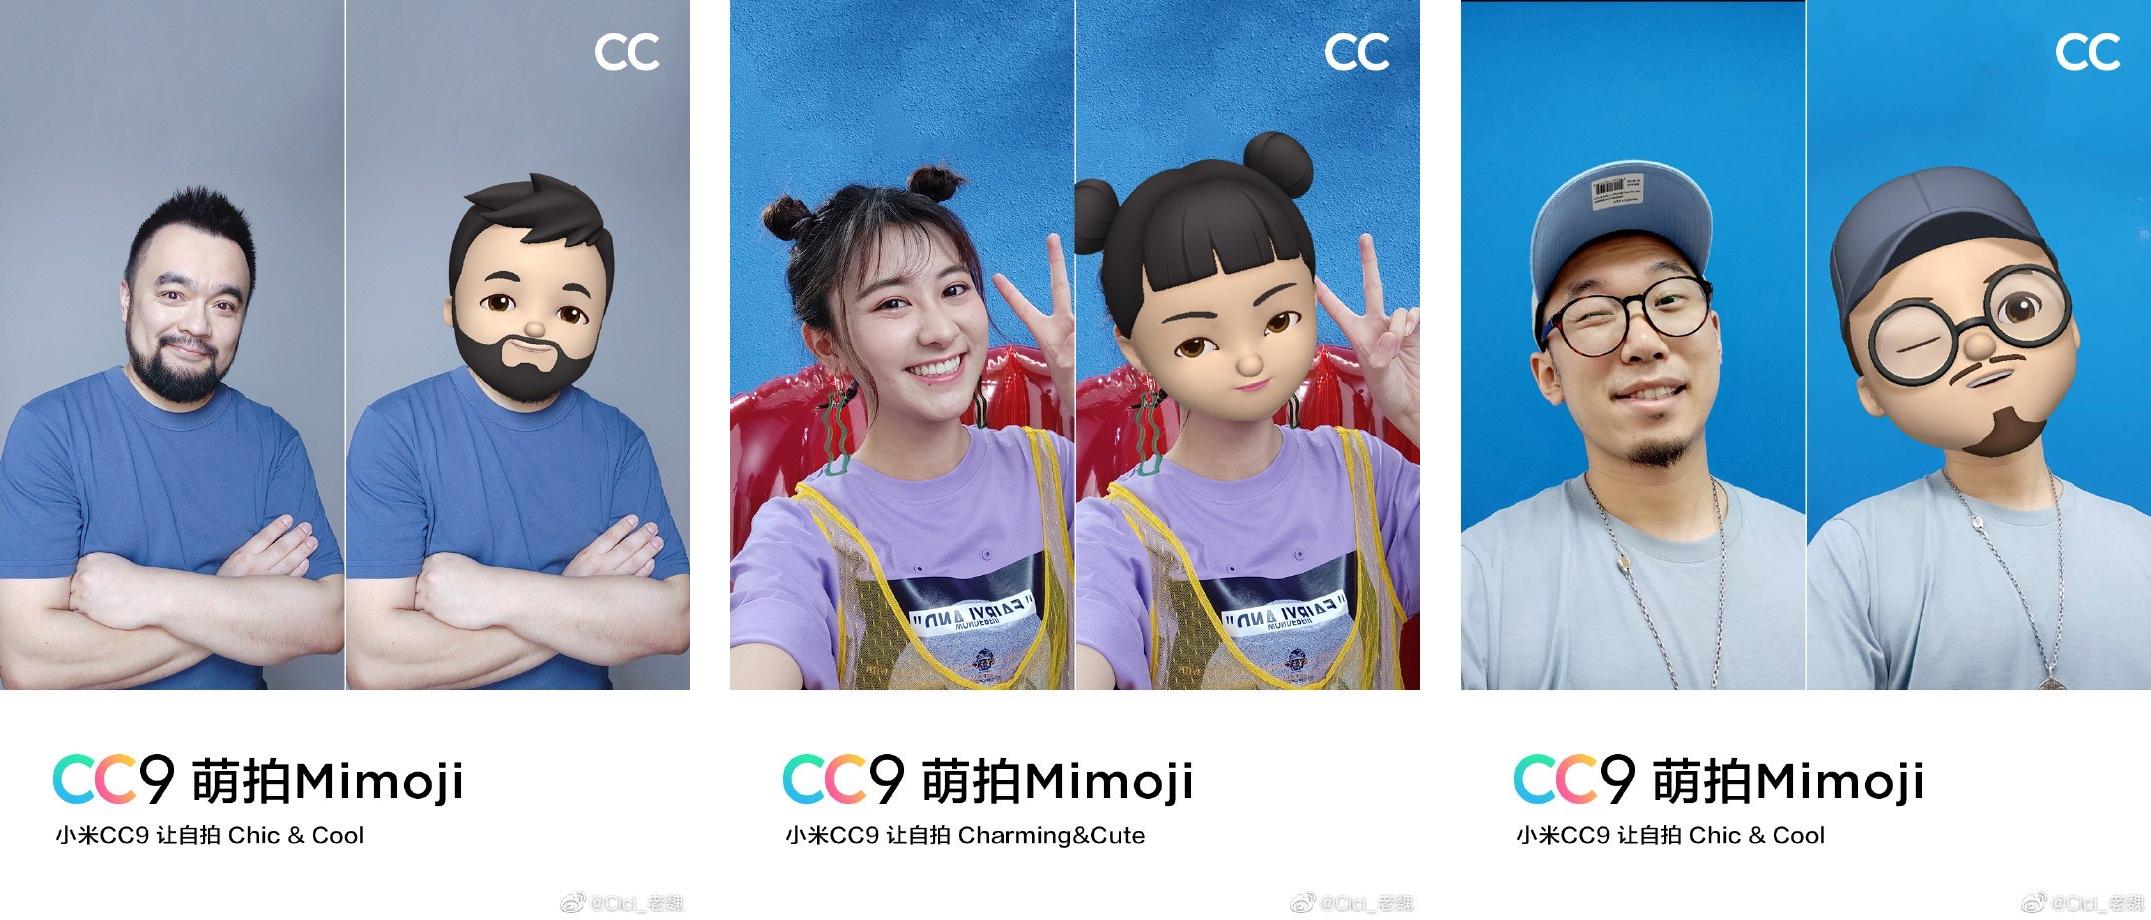 Mimojis da Xiaomi